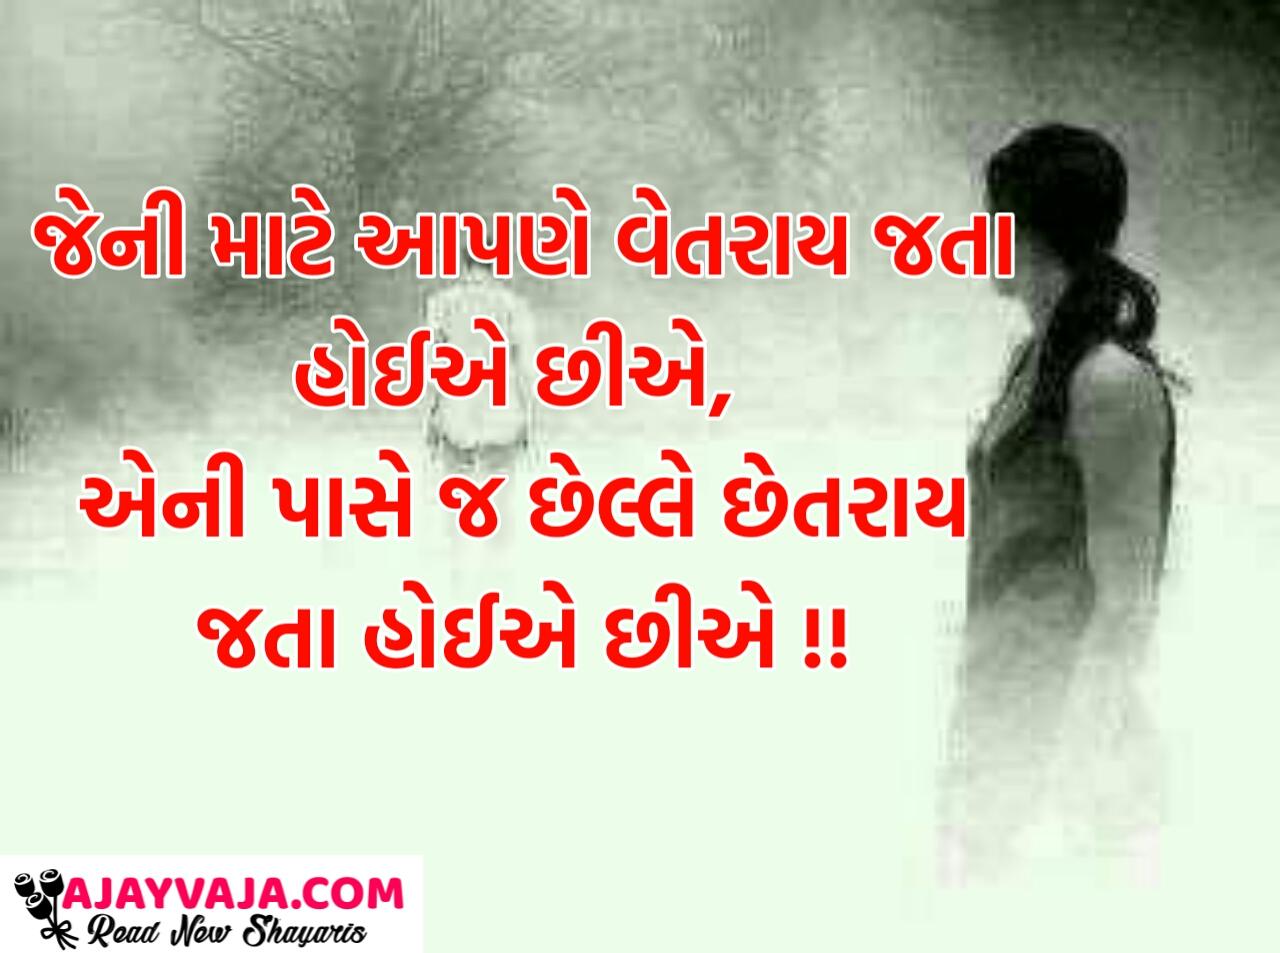 Shayari photos